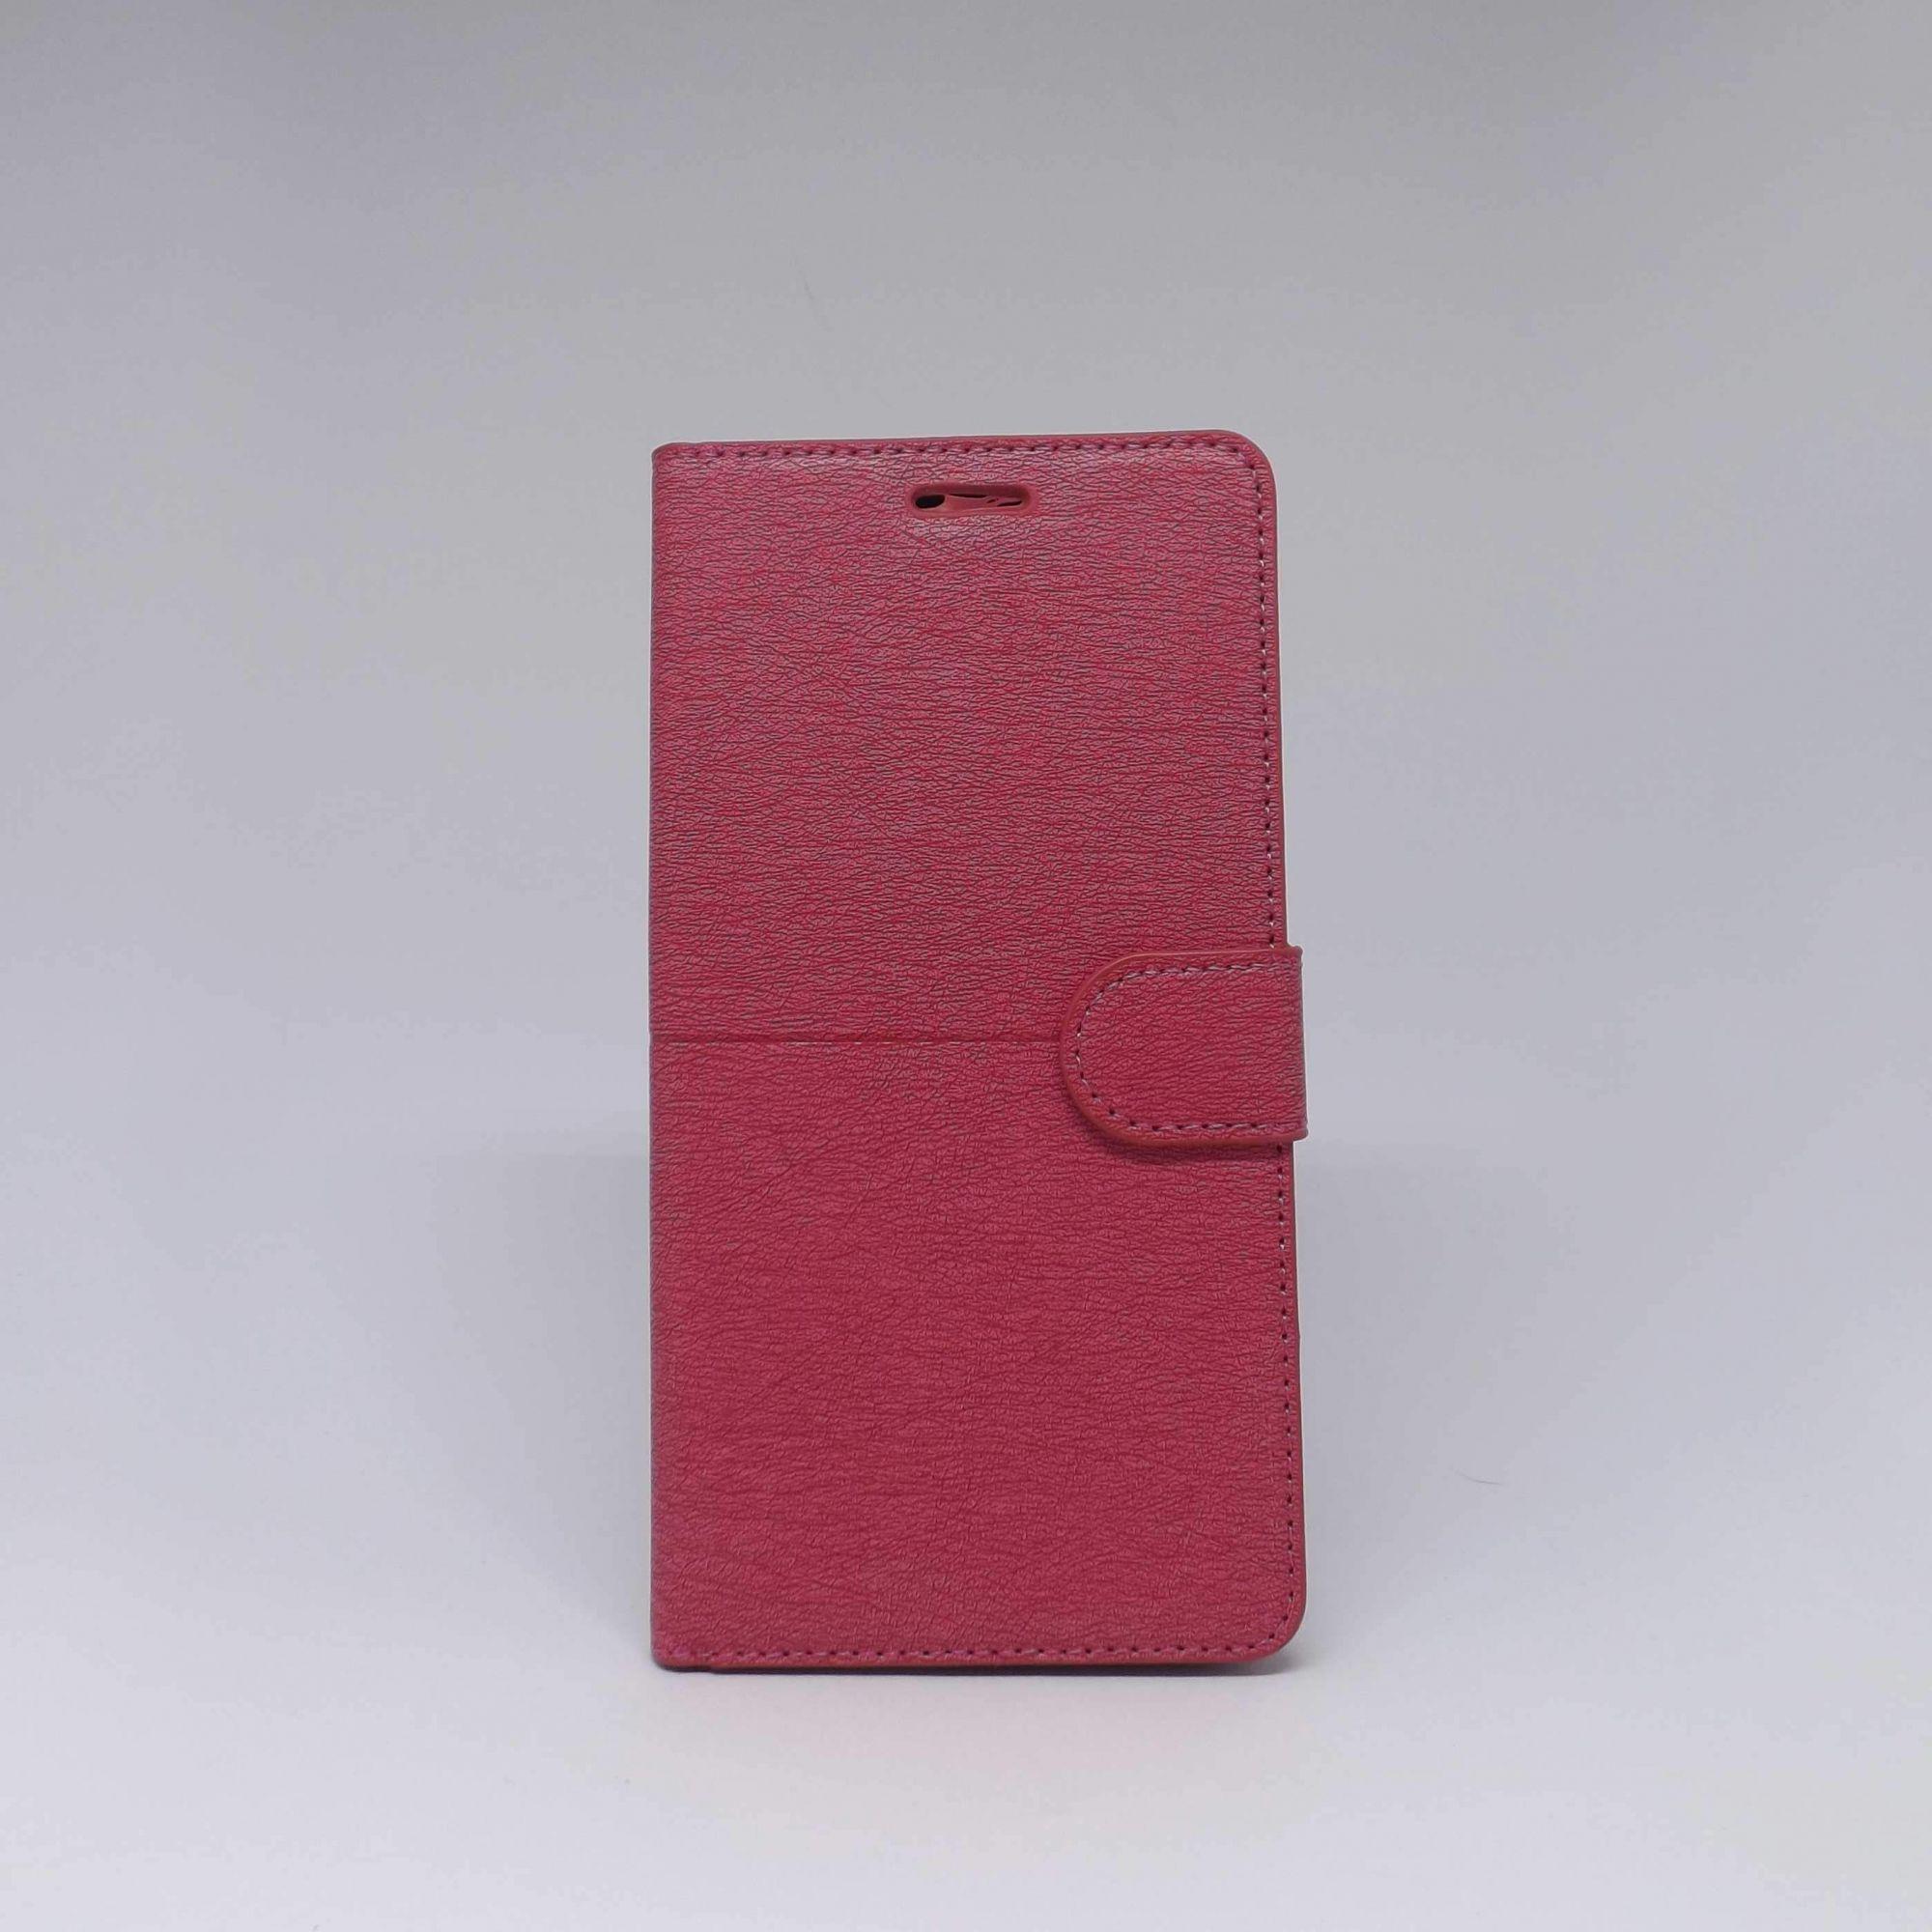 Capa Zenfone Max Plus M1 Carteira